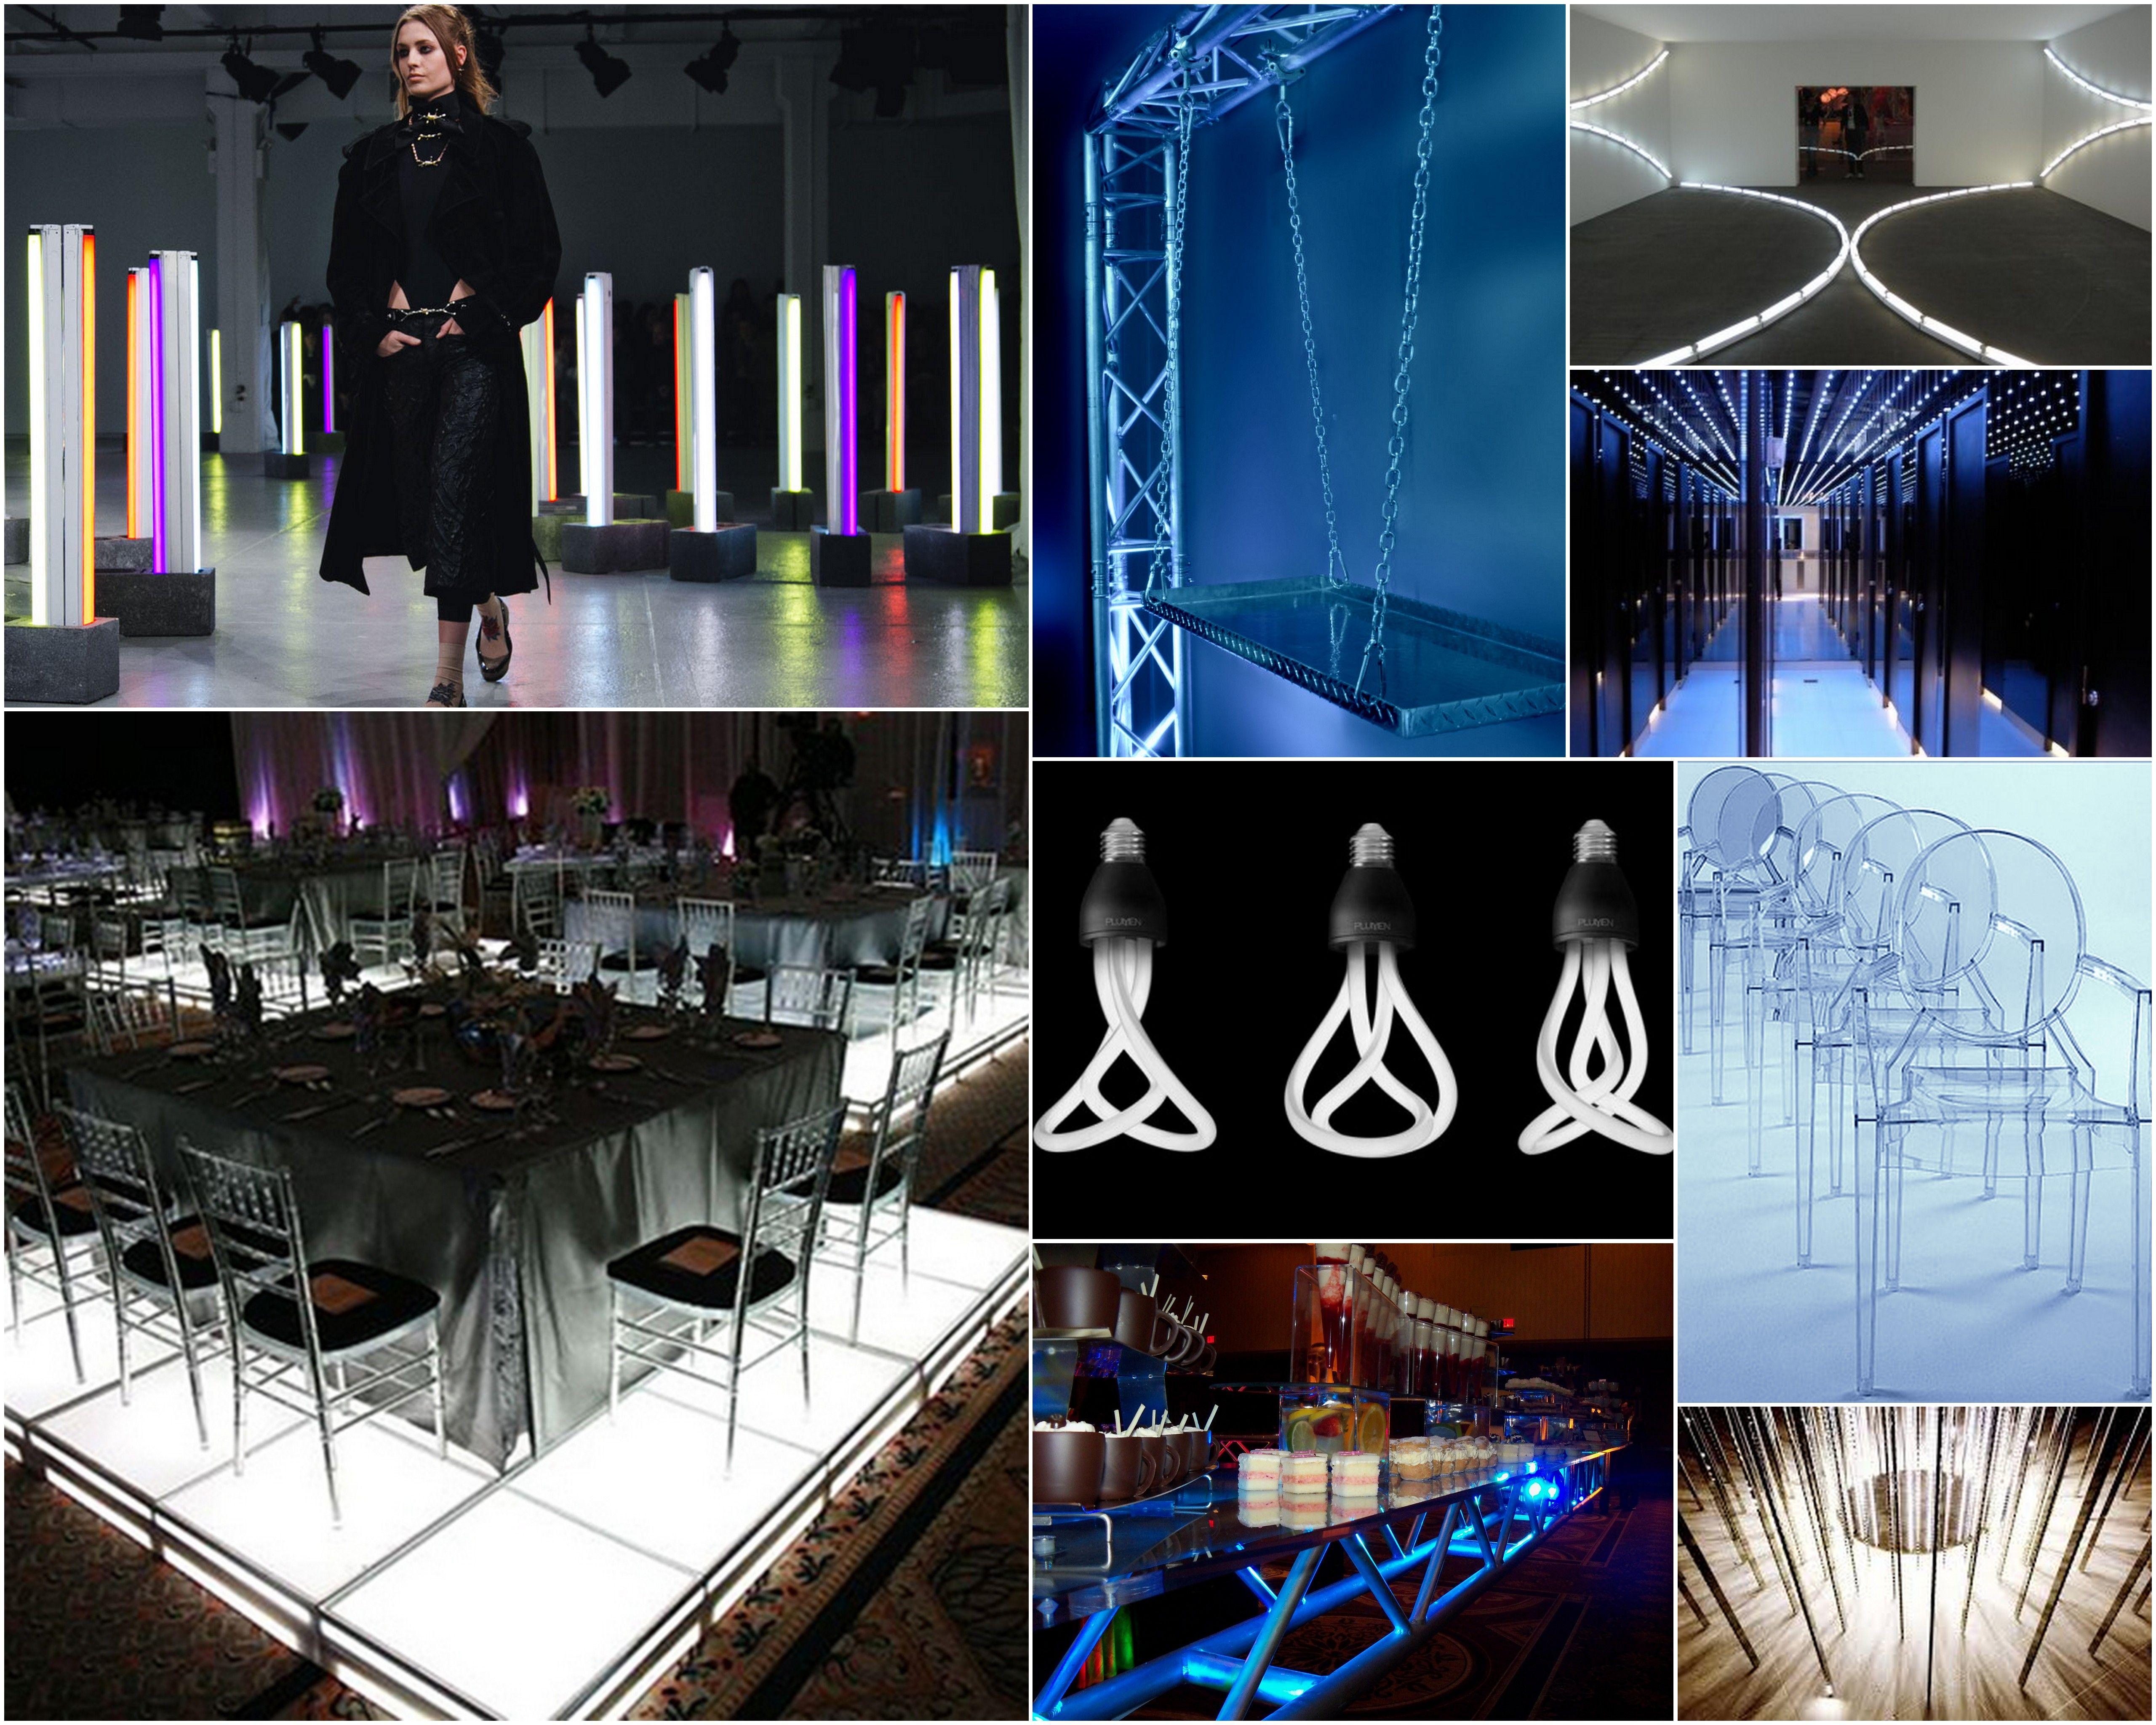 futuristic event decor inspiration for a forward thinking